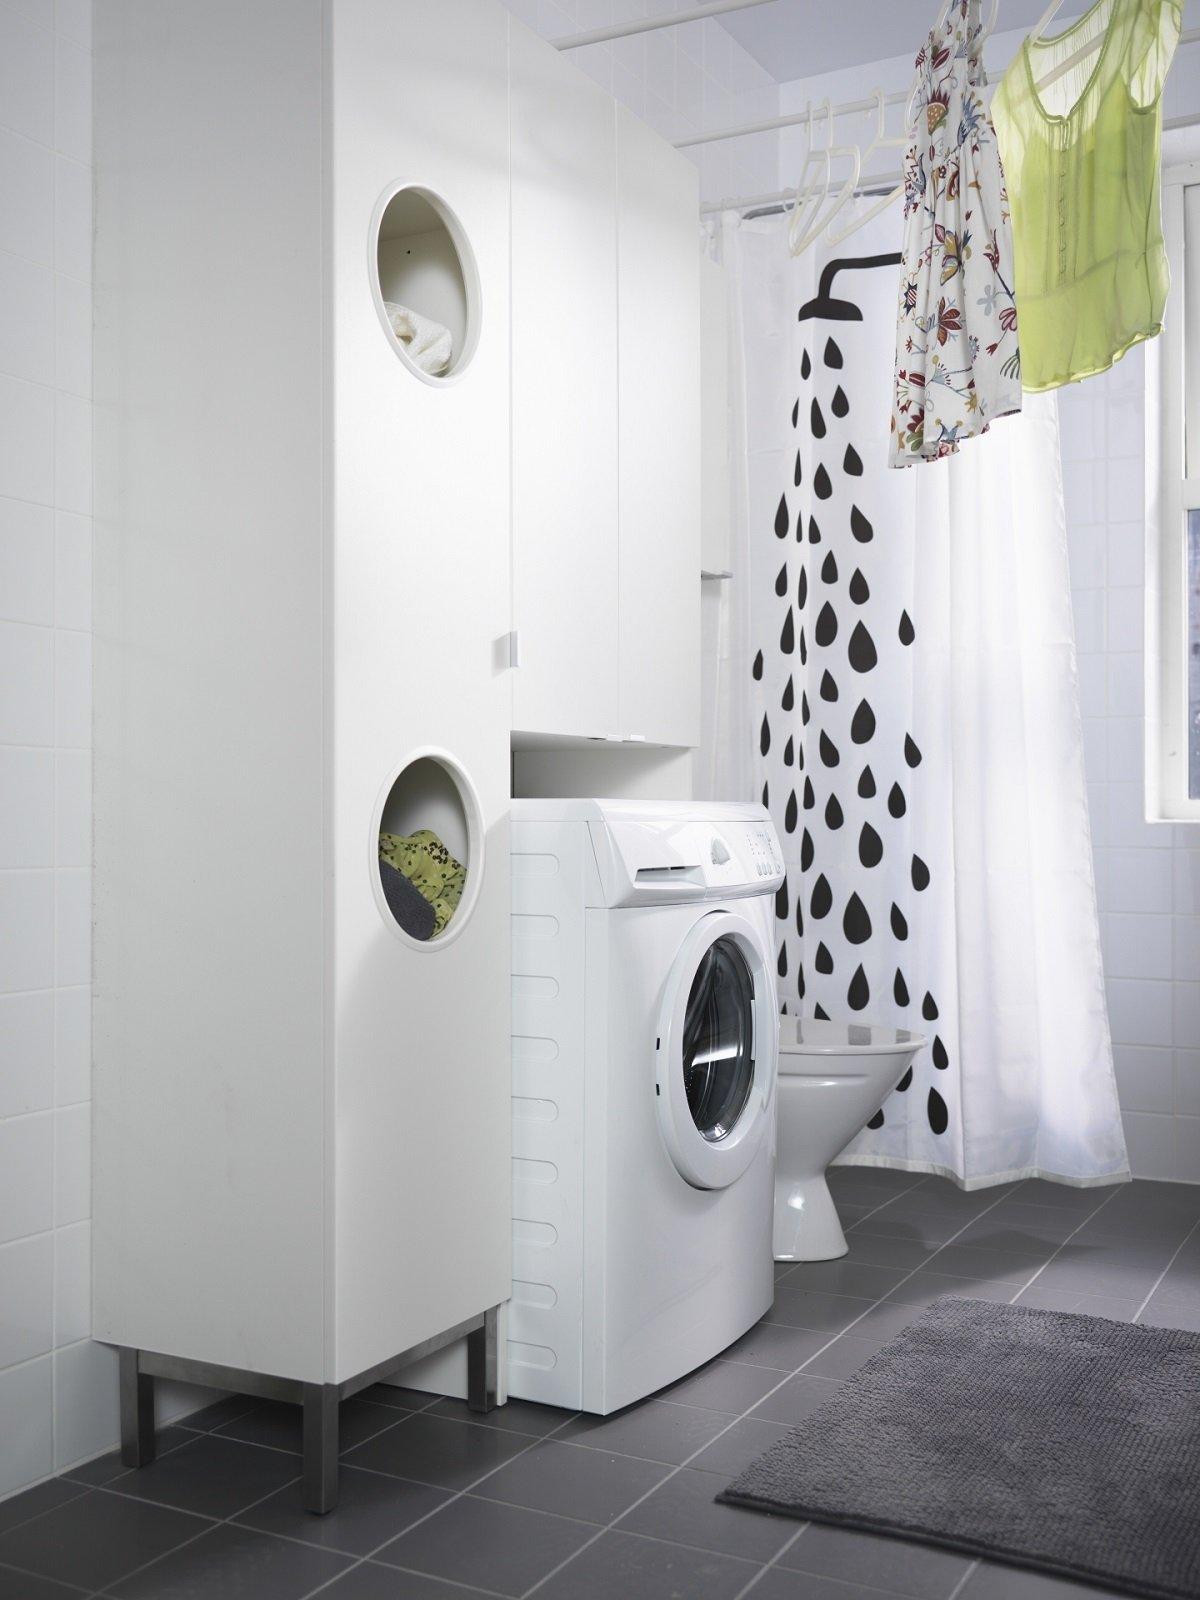 Lavanderia in bagno cose di casa - Ikea mobili per lavanderia ...